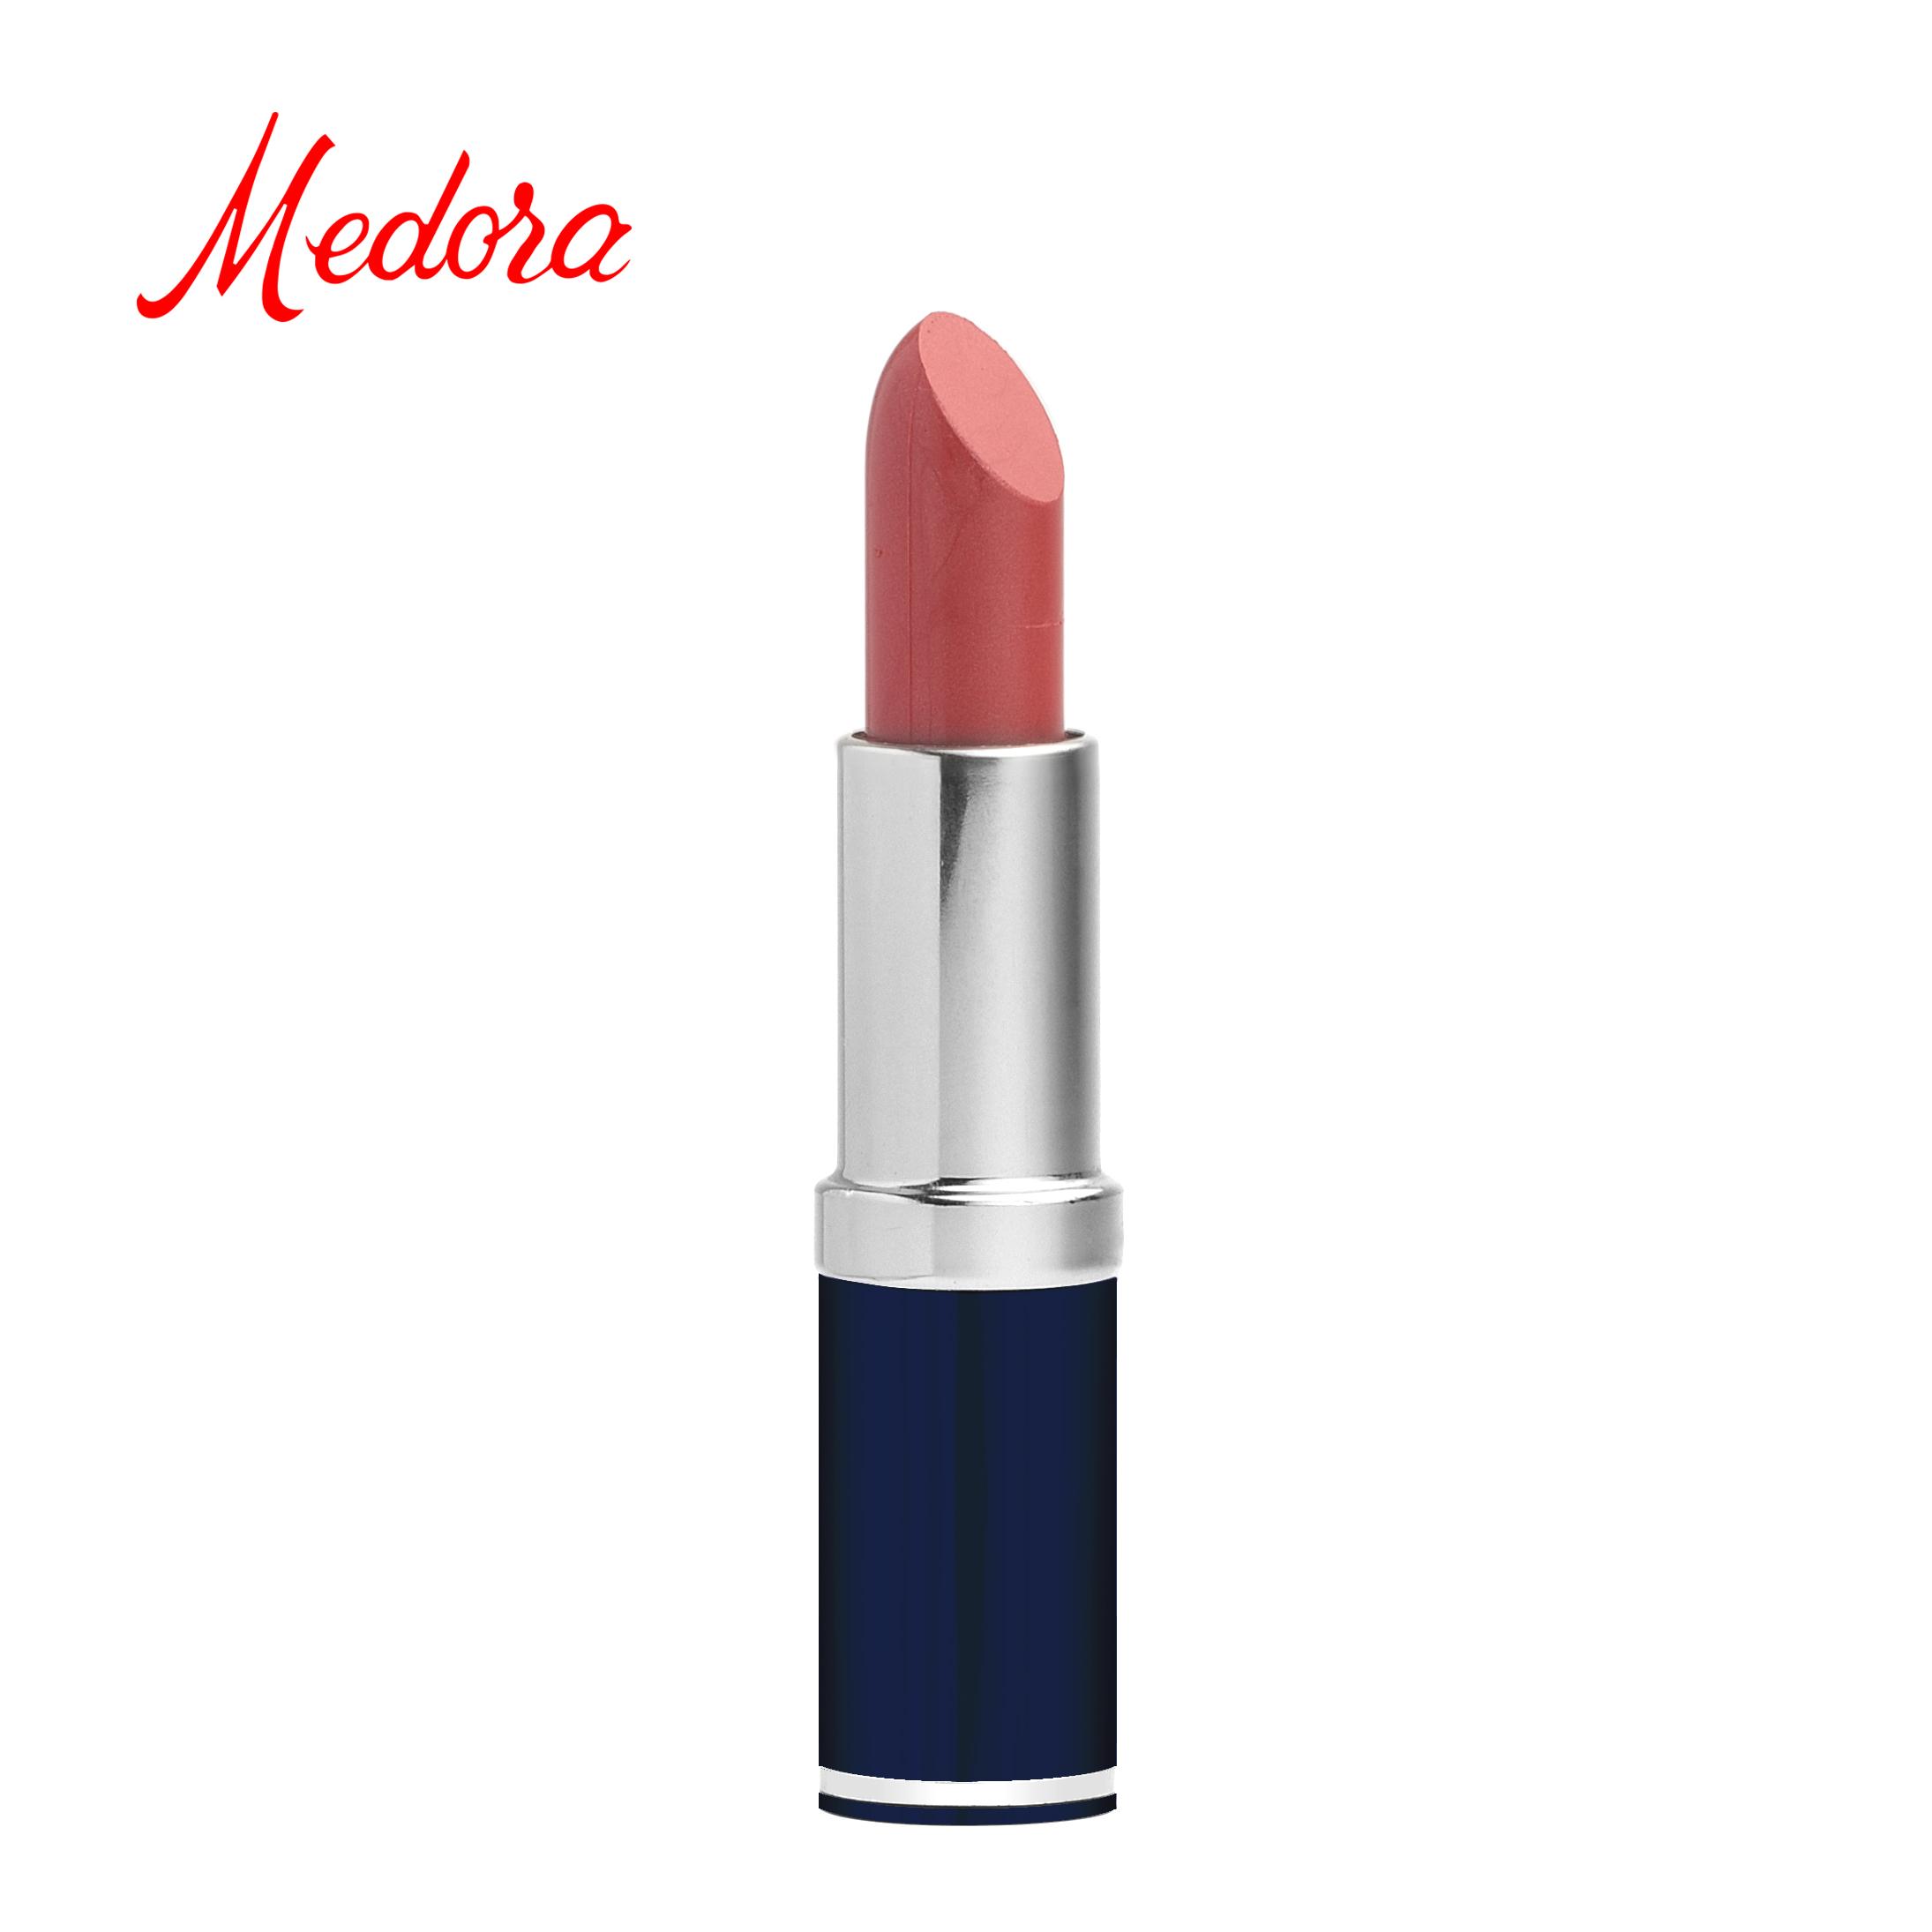 Medora Lipstick Semi Matte Buy Online At Best Prices In Pakistan Daraz Pk